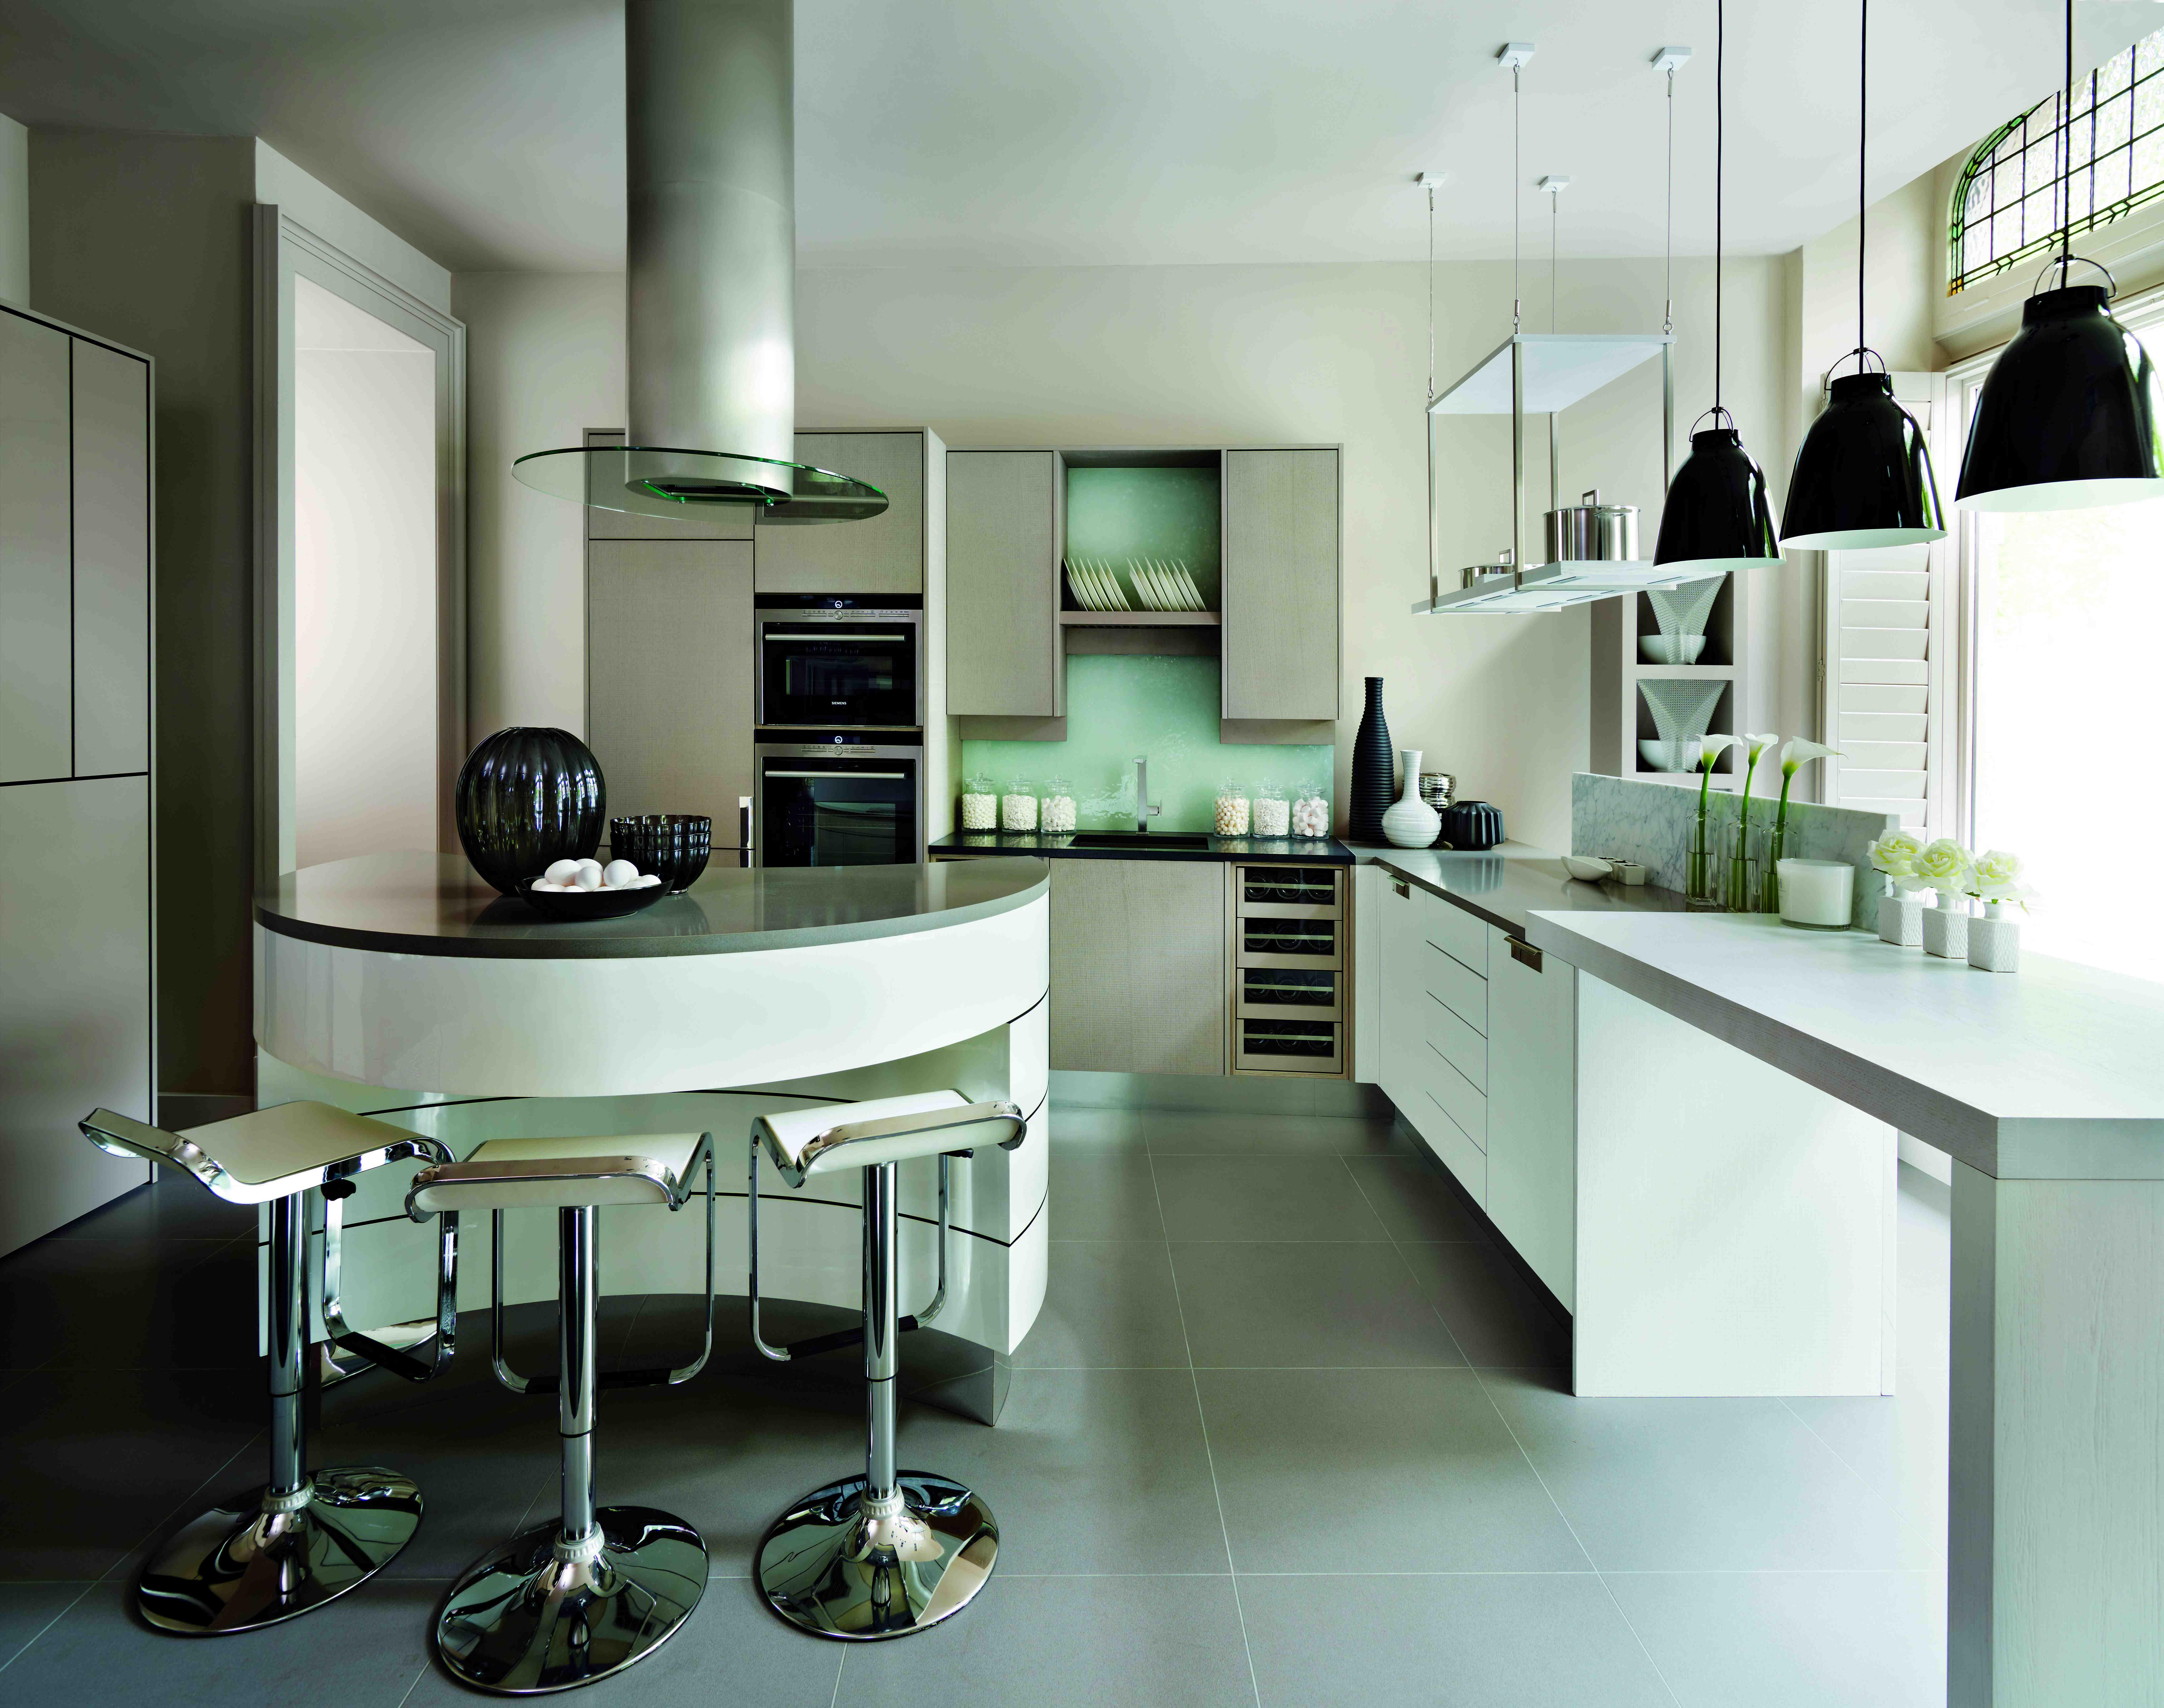 smallbone kelly hoppen kitchen interiors inside